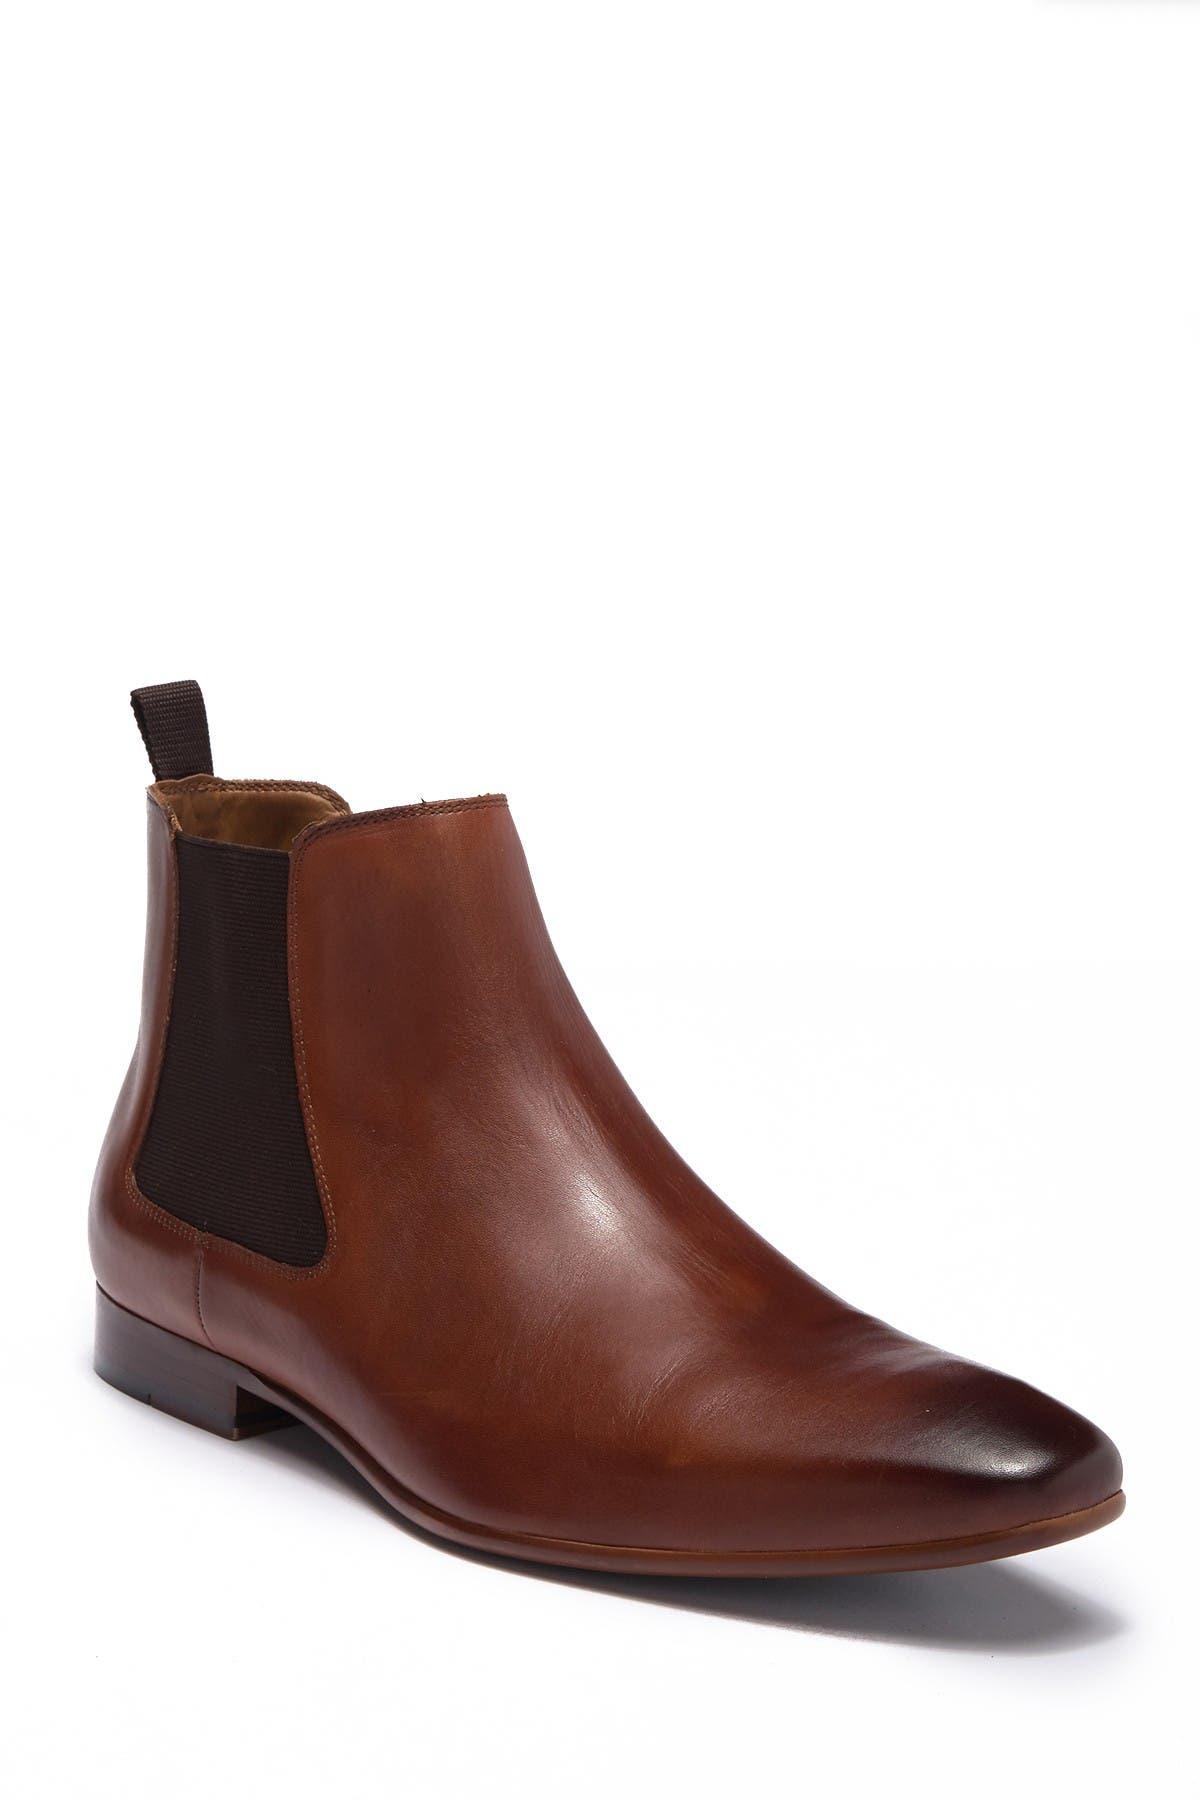 Image of Aldo Frelini Leather Chelsea Boot